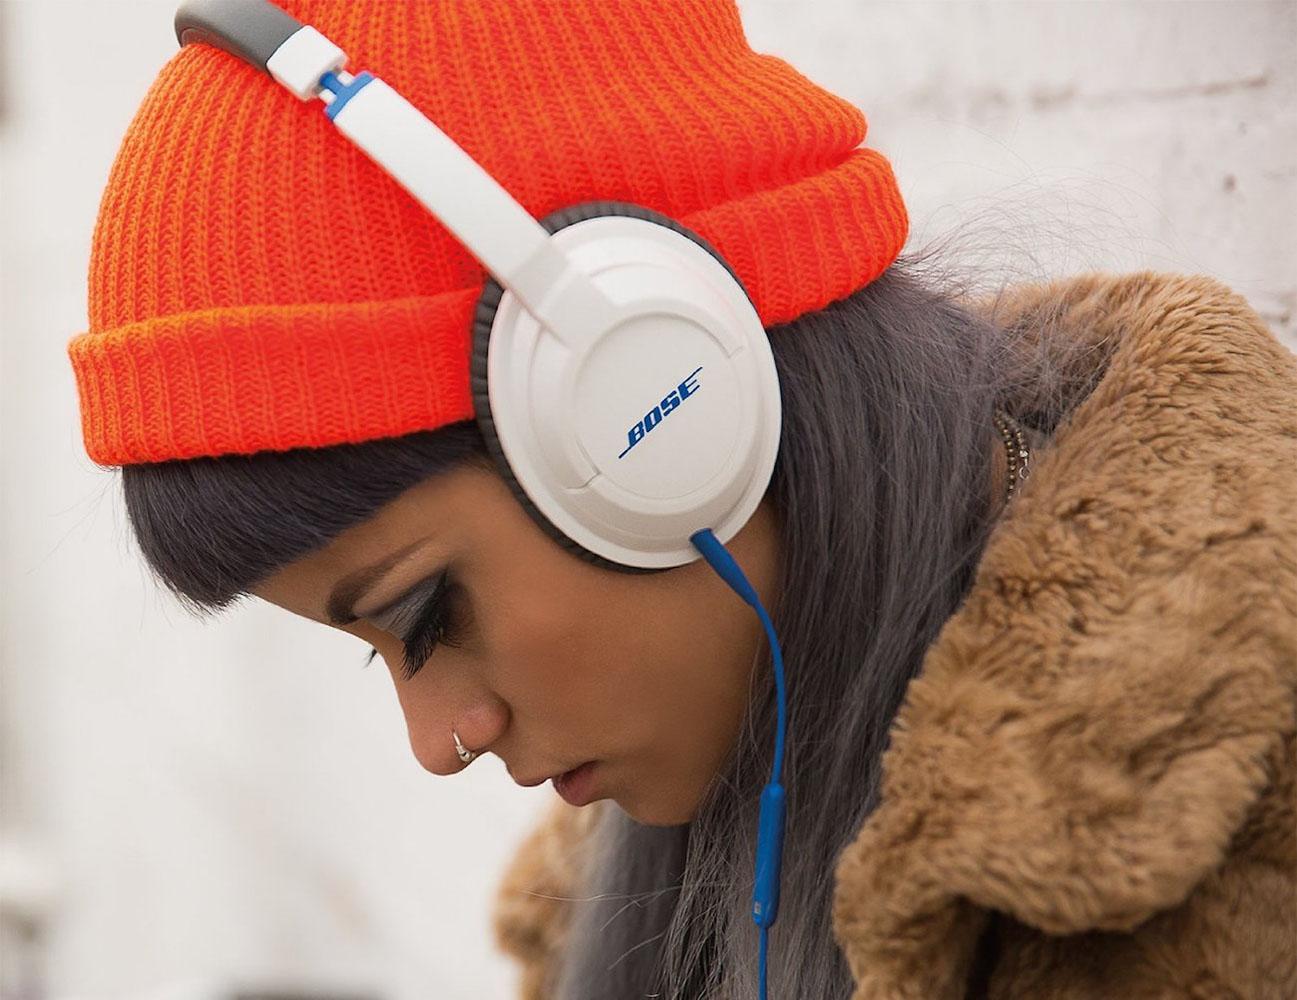 SoundTrue Headphones by Bose